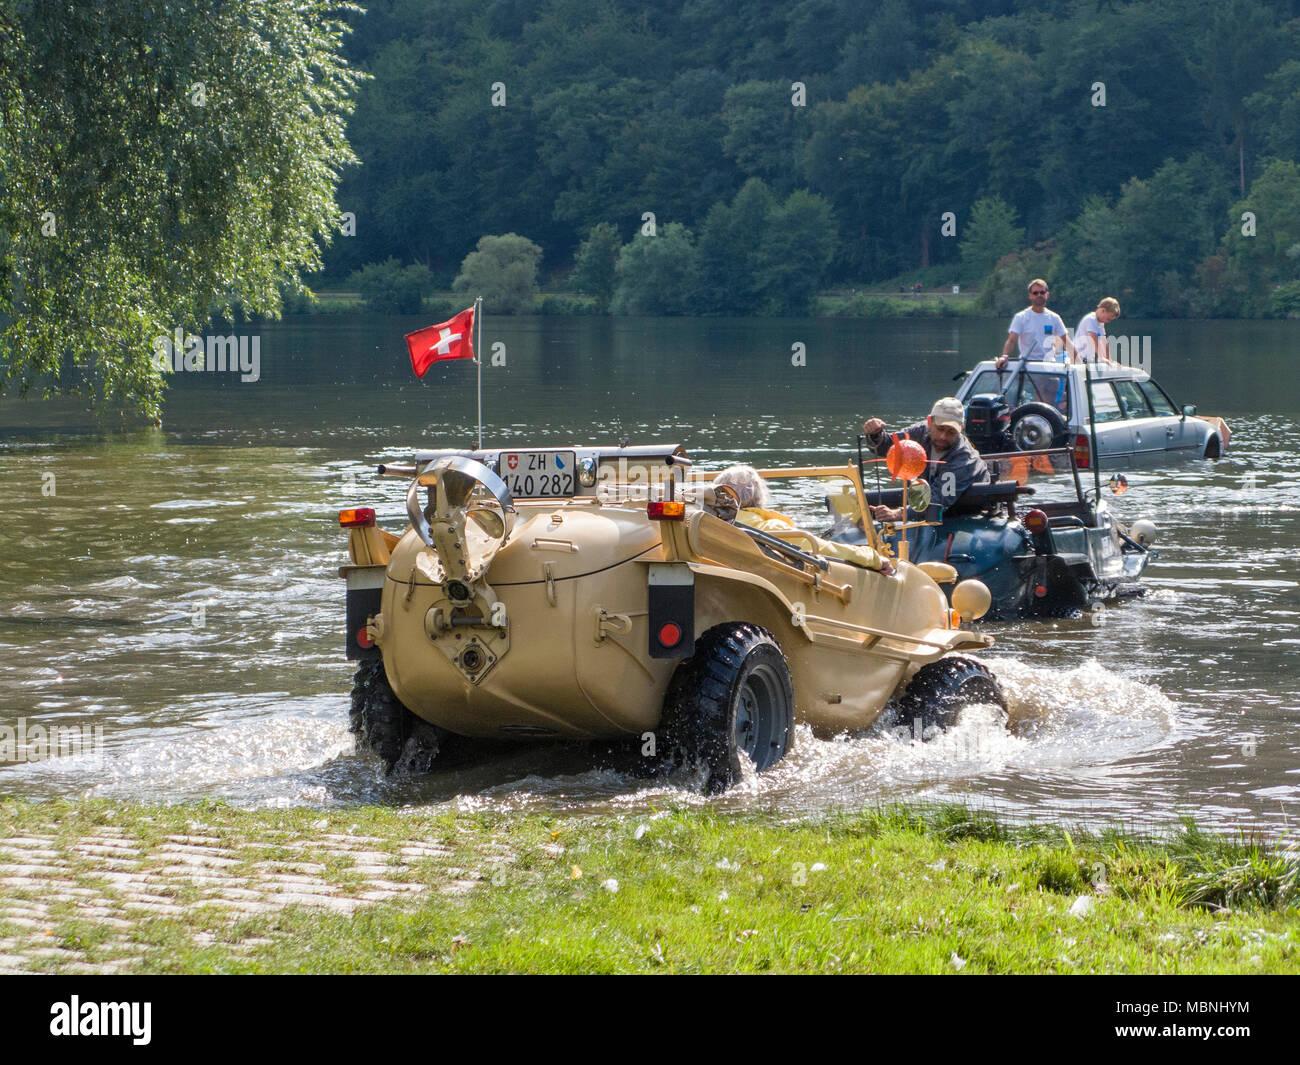 VW Typ 166, a german amphibious vehicle built at the 2nd world war driving on Moselle river, Minheim, Rhineland-Palatinate, Germany Stock Photo